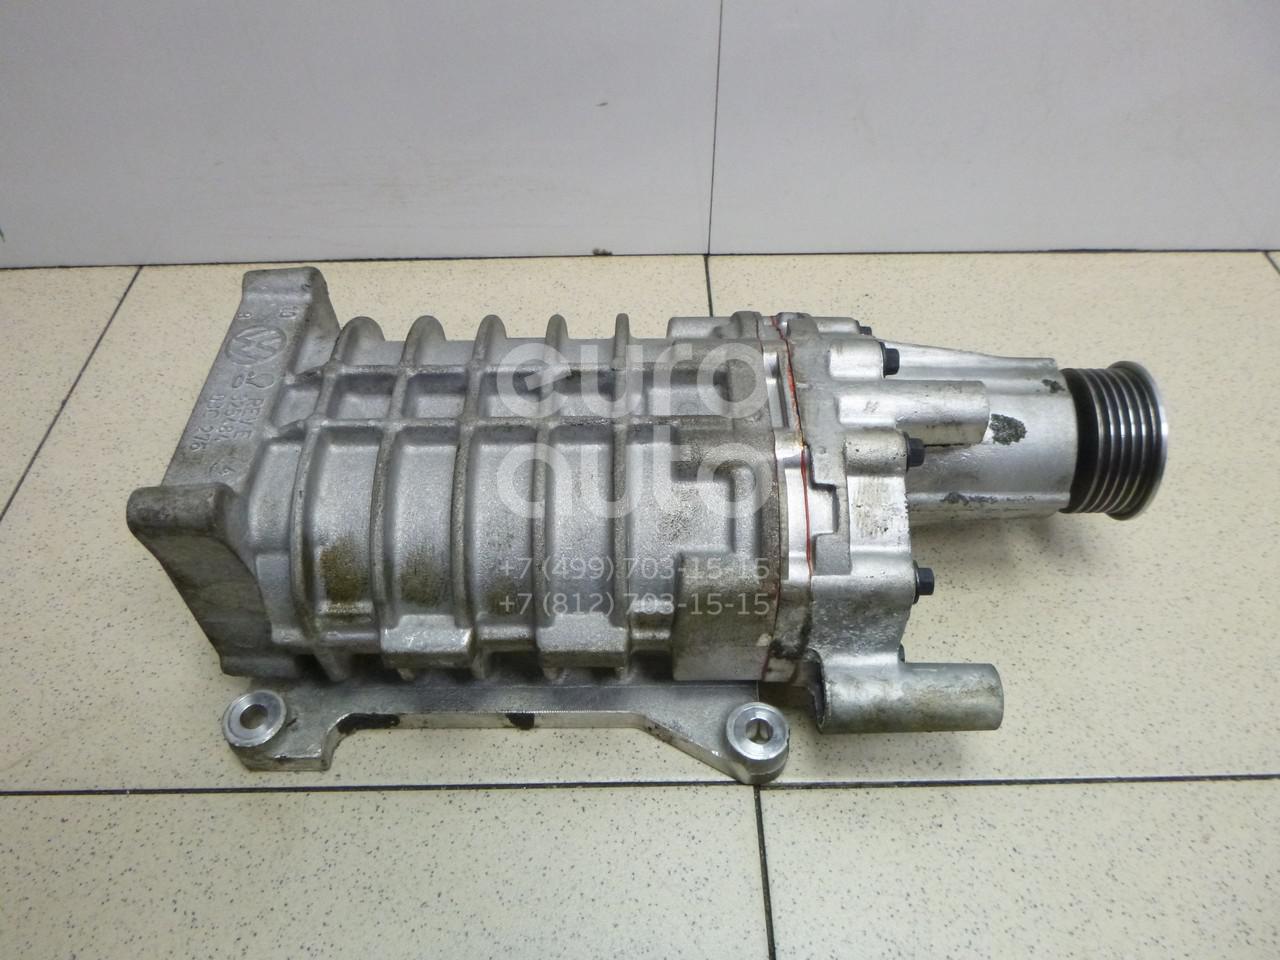 Купить Турбокомпрессор (турбина) VW Passat [B6] 2005-2010; (03C145601E)